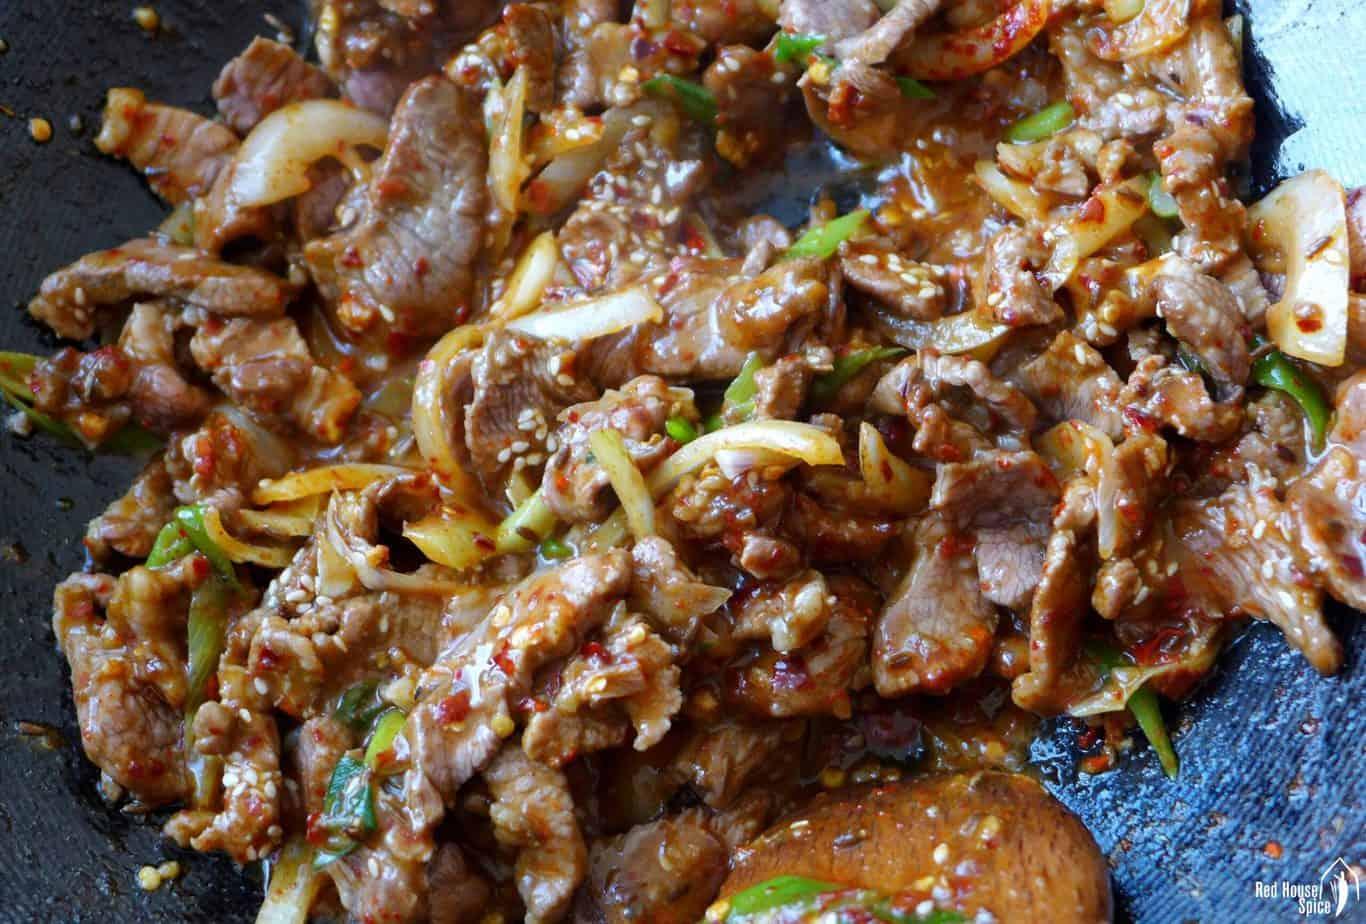 Stir-frying lamb